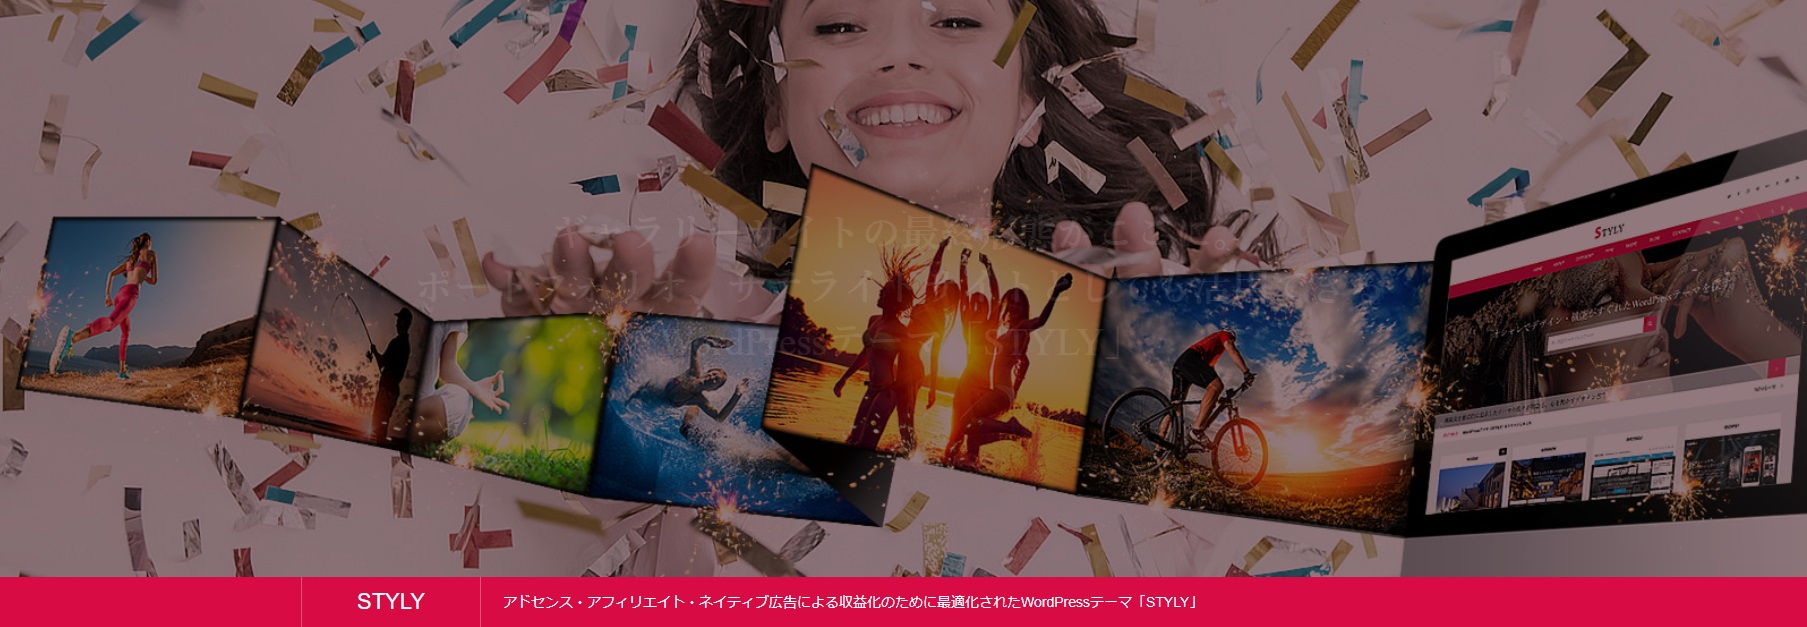 WordPressテーマ「STYLY」TCD052の評判・評価・口コミ【有料日本語ワードプレステンプレート】